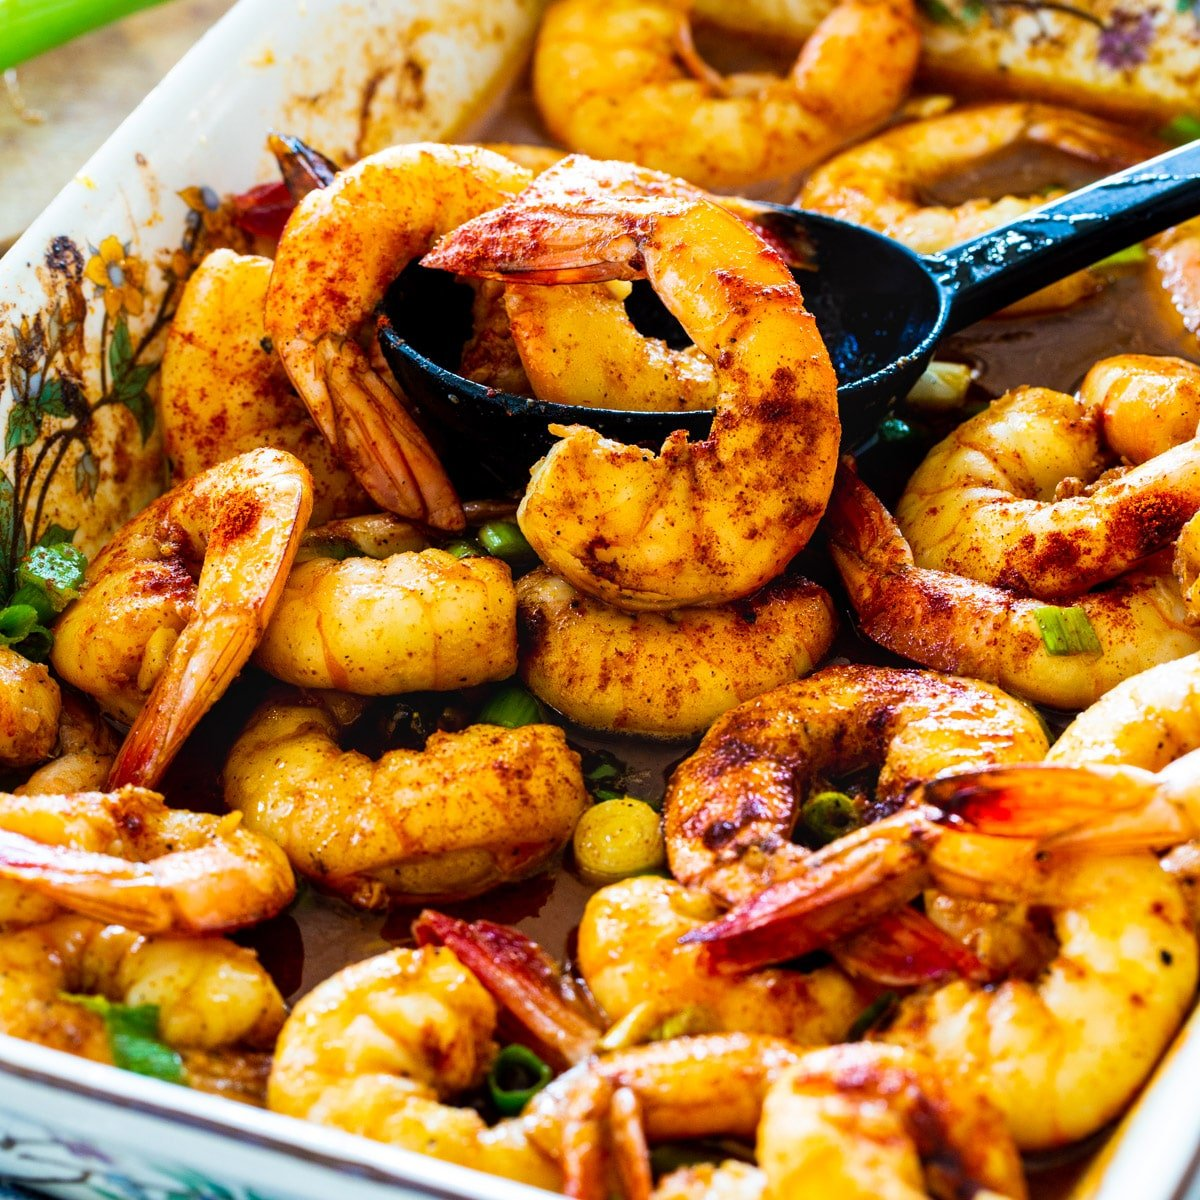 Baked Honey Cajun Shrimp in a baking dish.